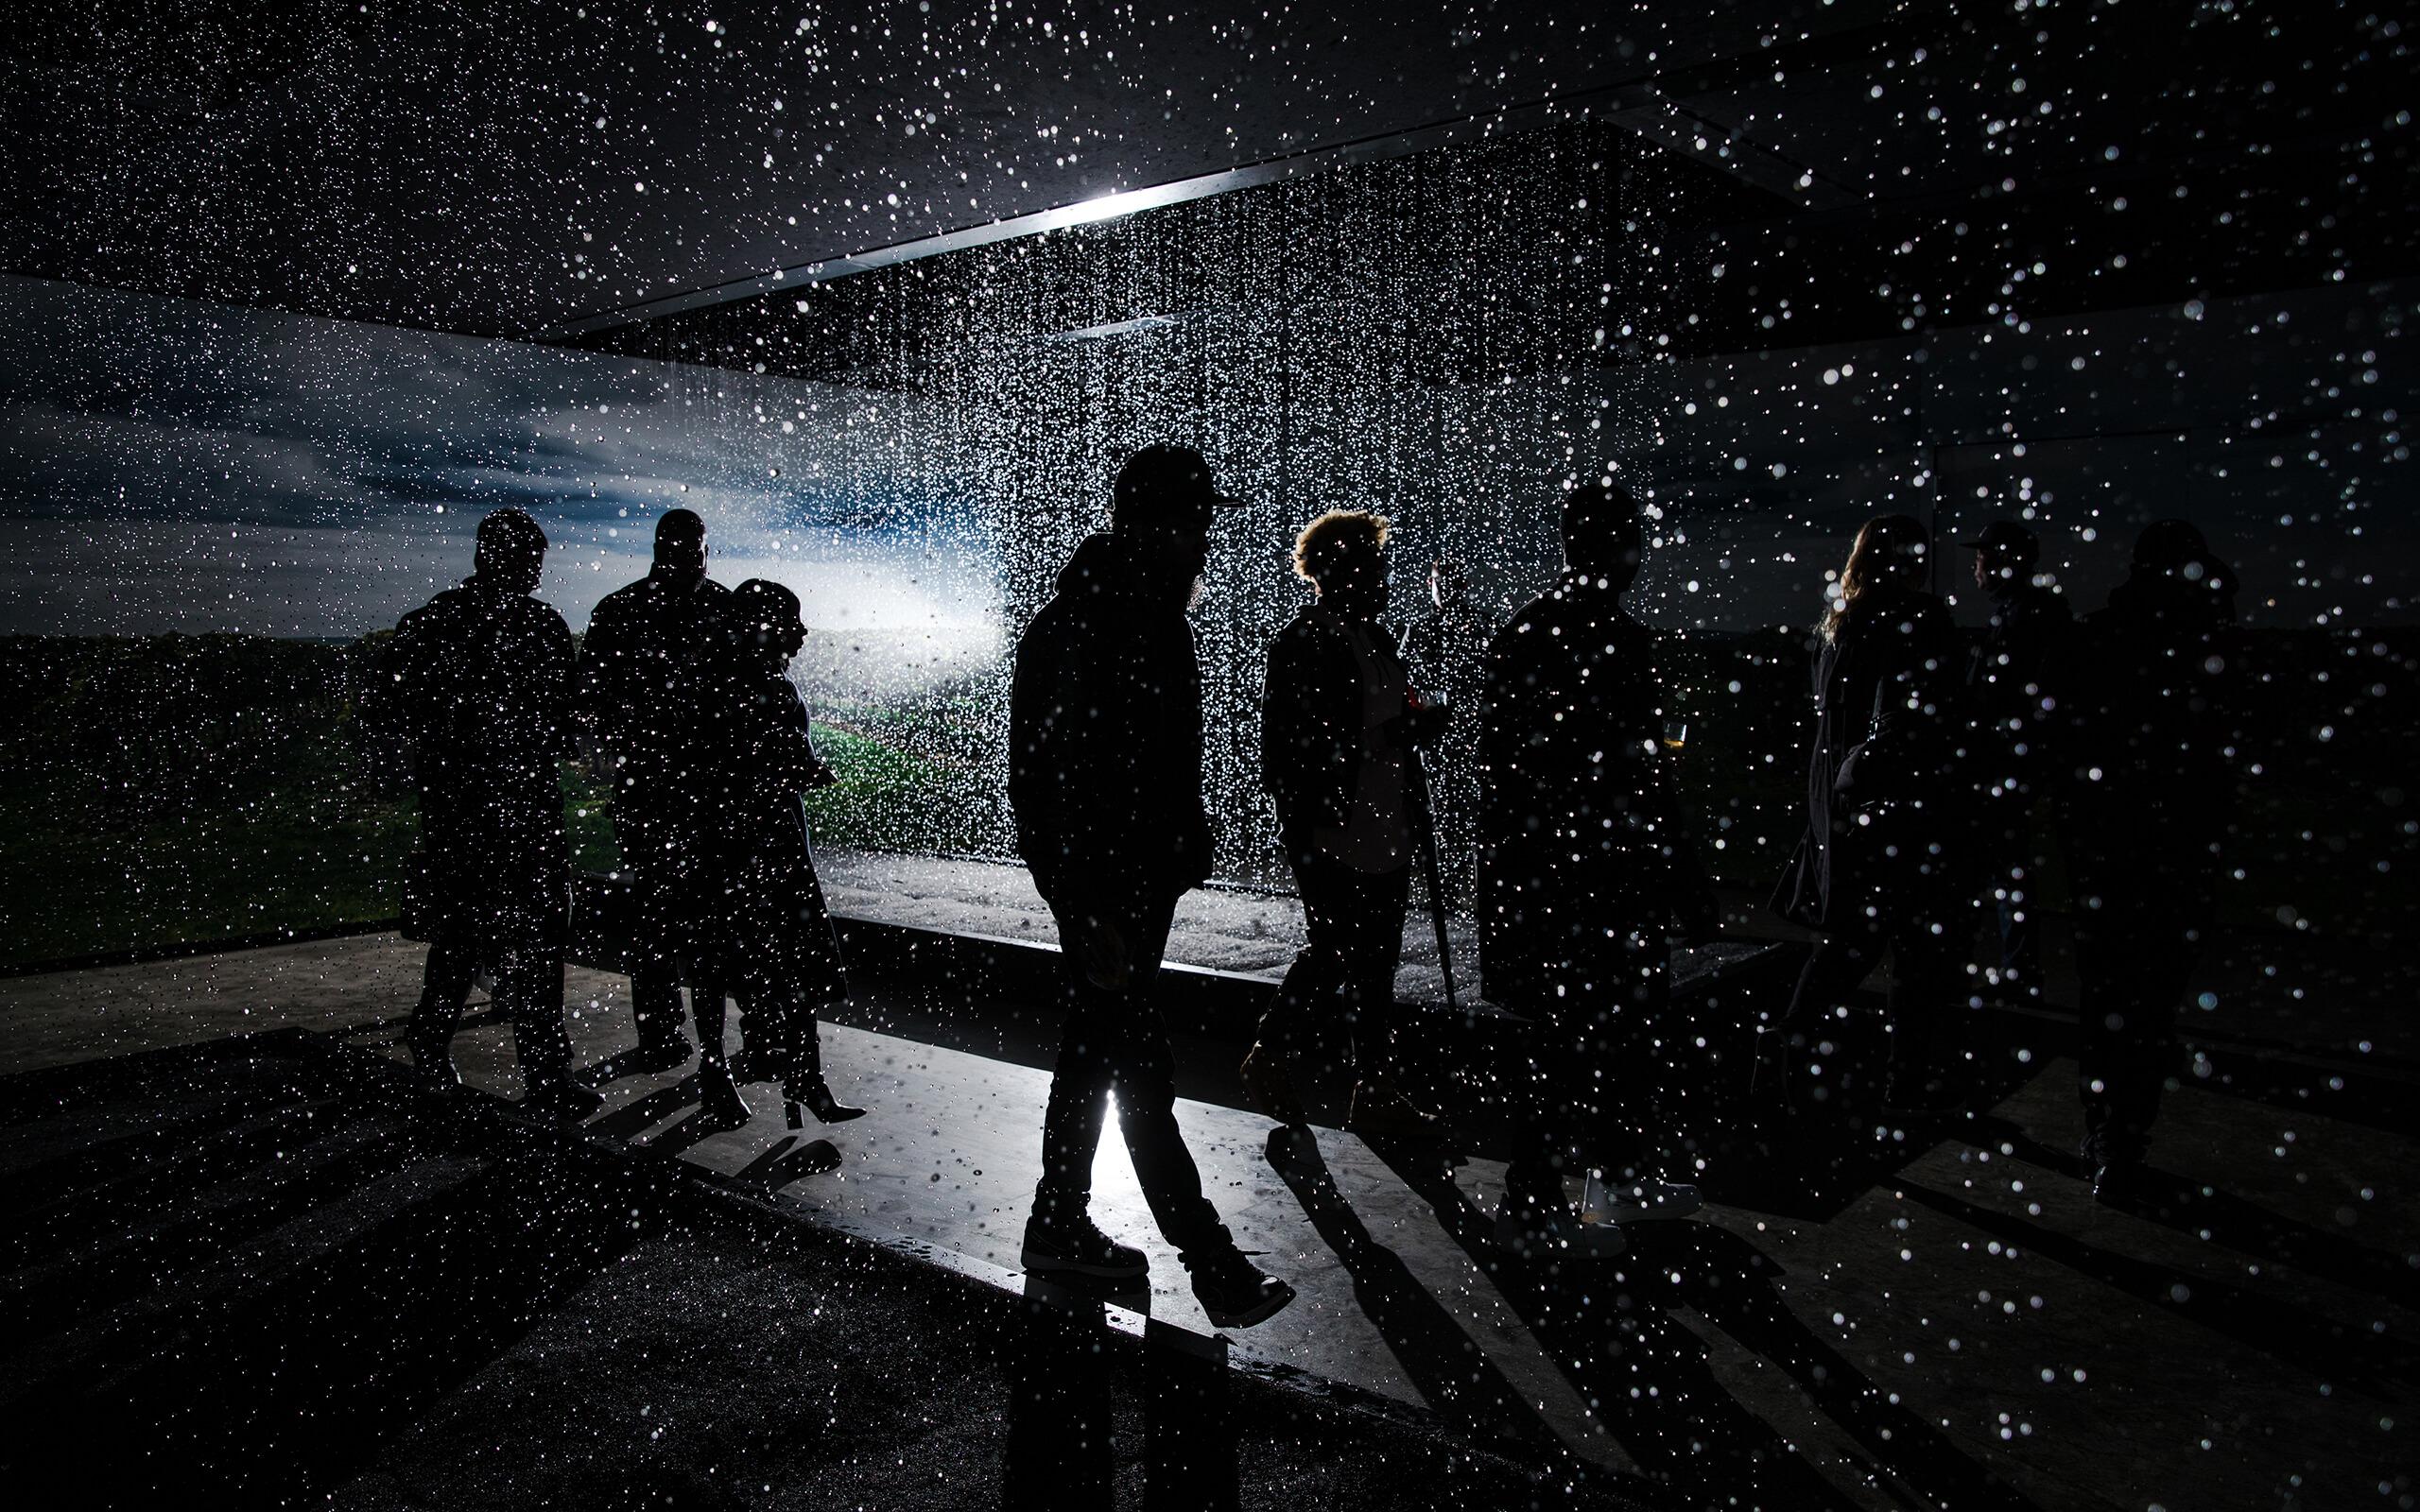 Rain room experience